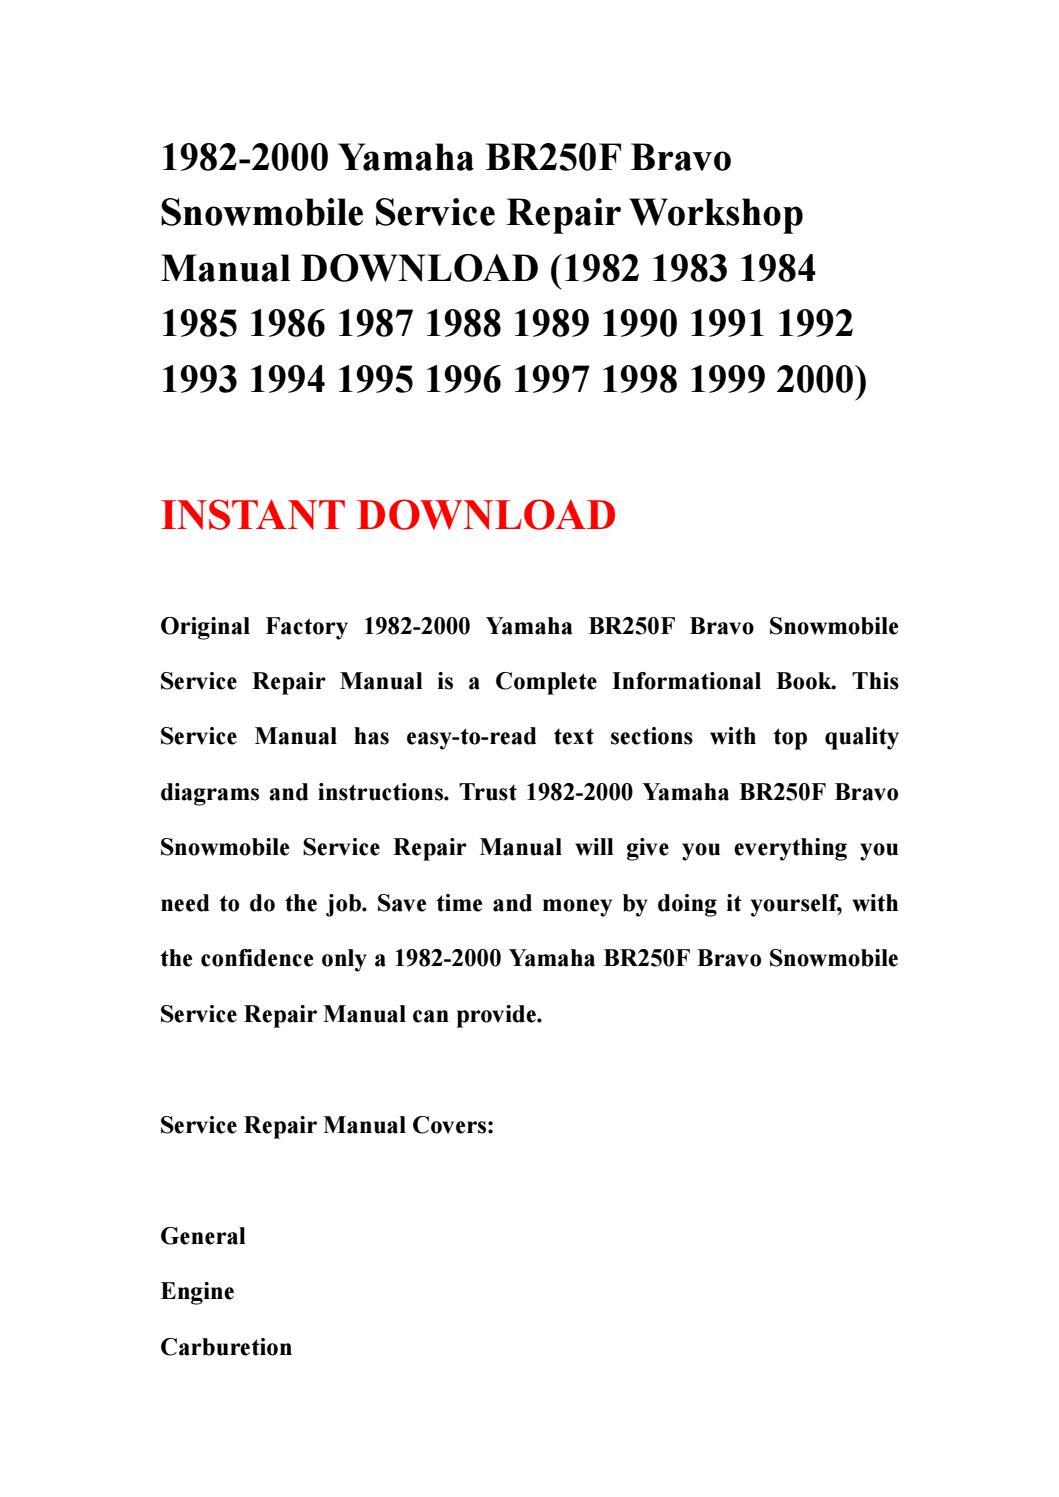 1982 2000 yamaha br250f bravo snowmobile service repair workshop manual  download (1982 1983 1984 198 by ksjenfne - issuu